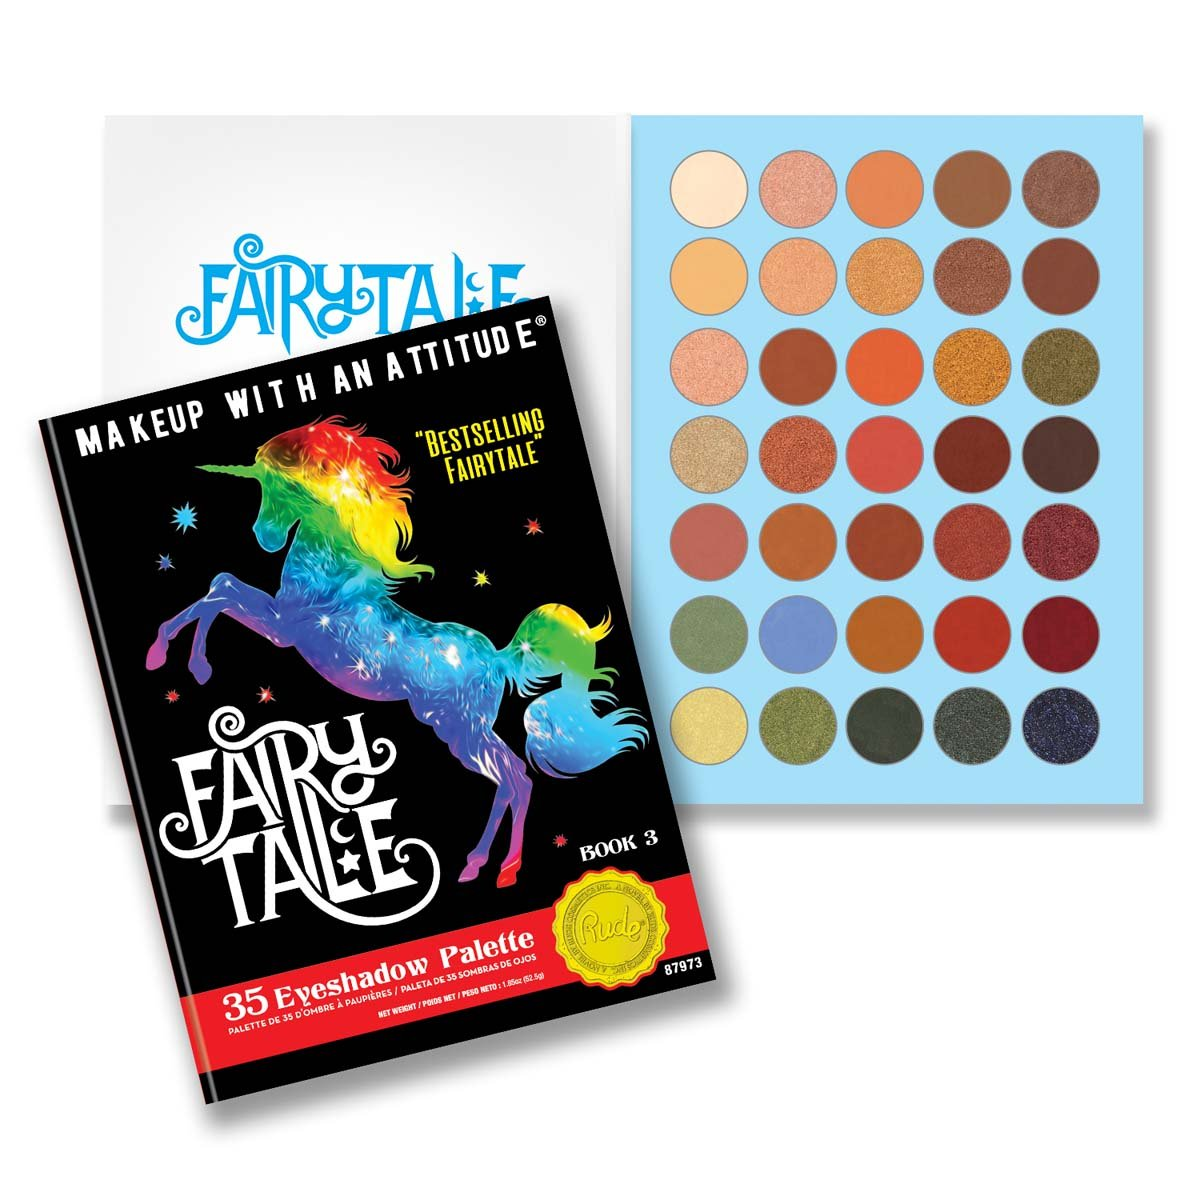 (6 Pack) RUDE Fairy Tales 35 Eyeshadow Palette - Book 3 (並行輸入品) B07BPBBYZG